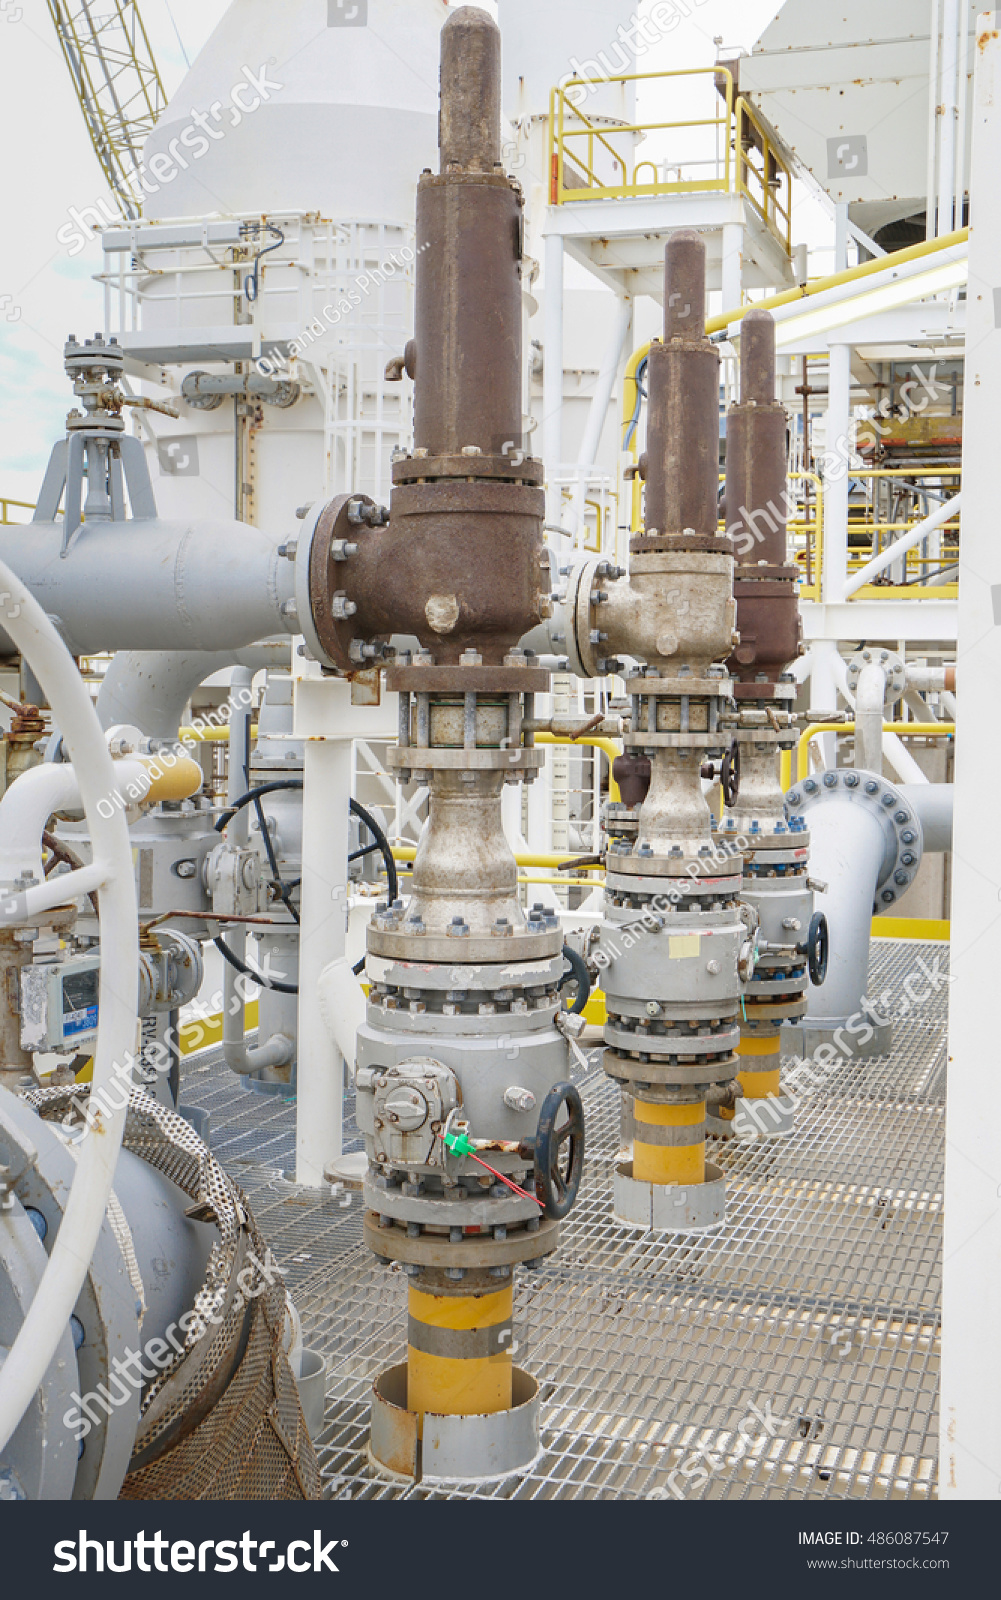 Pressure Safety Valve Install Top Pressurized Stock Photo